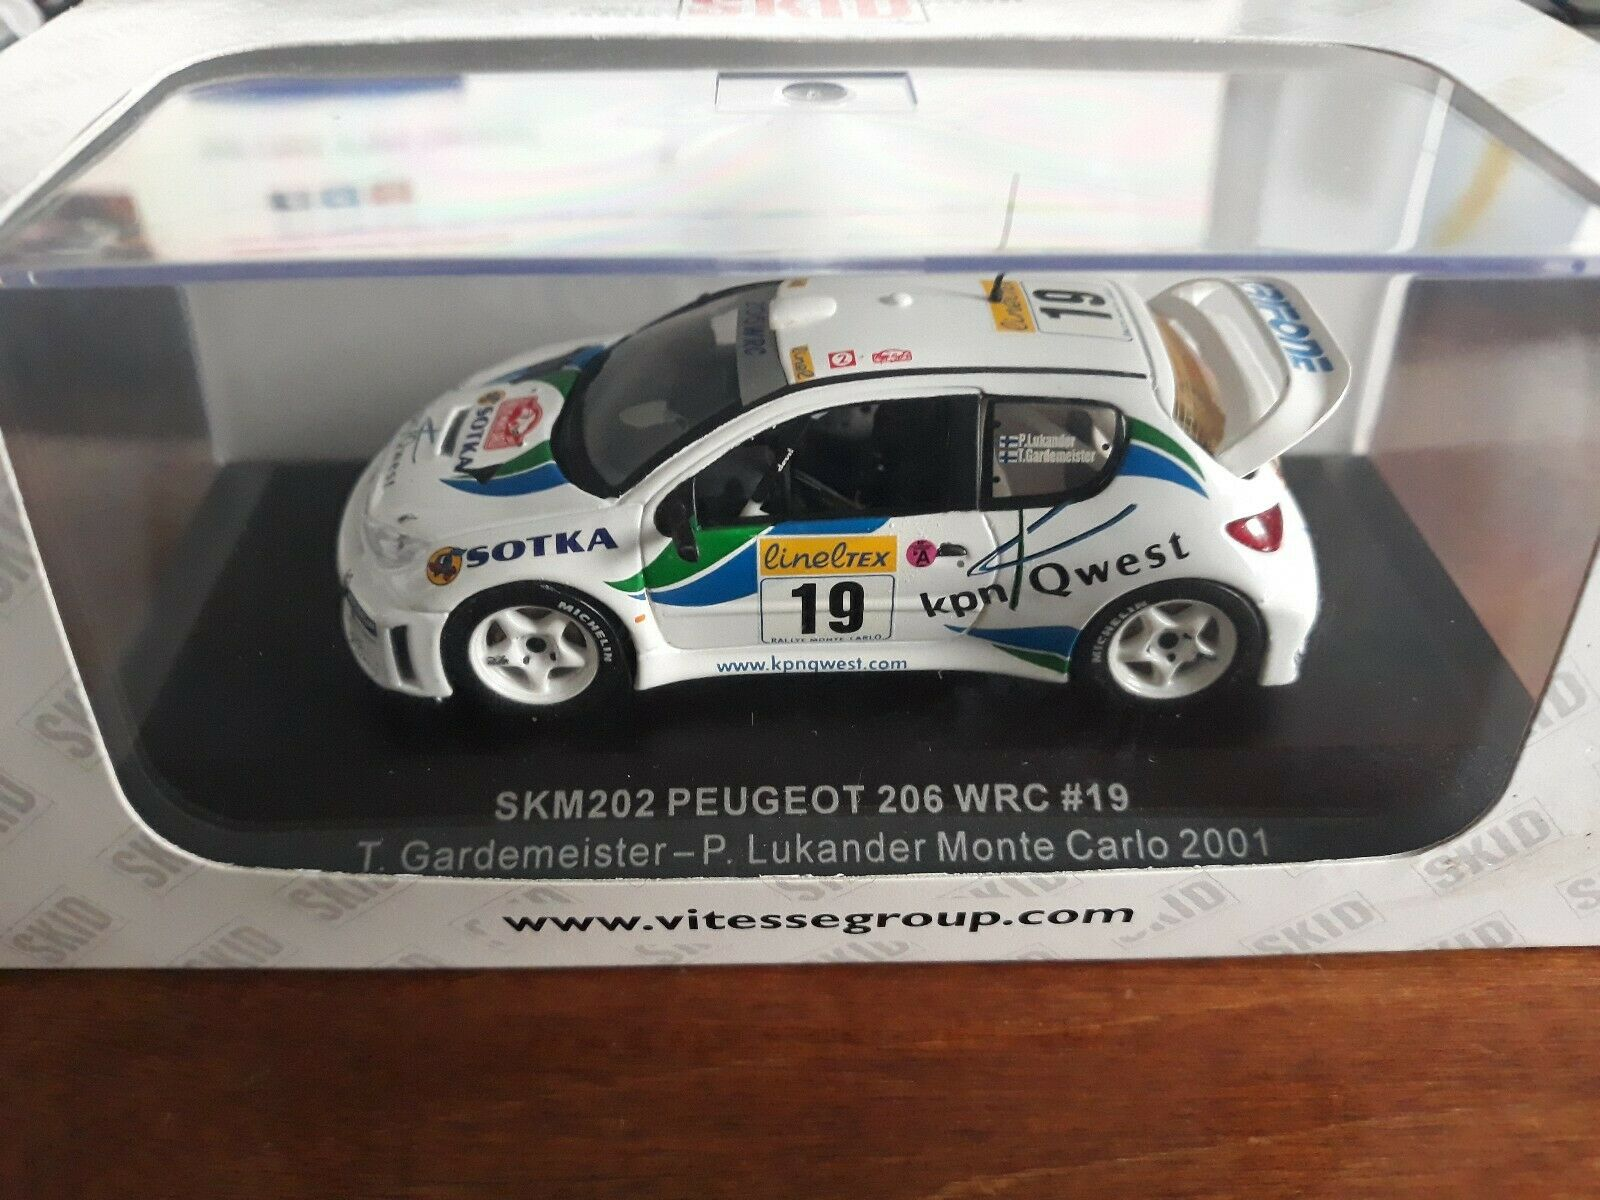 Skid 1 43 Peugeot 206 WRC Rally Monte Carlo 2001 SKM202